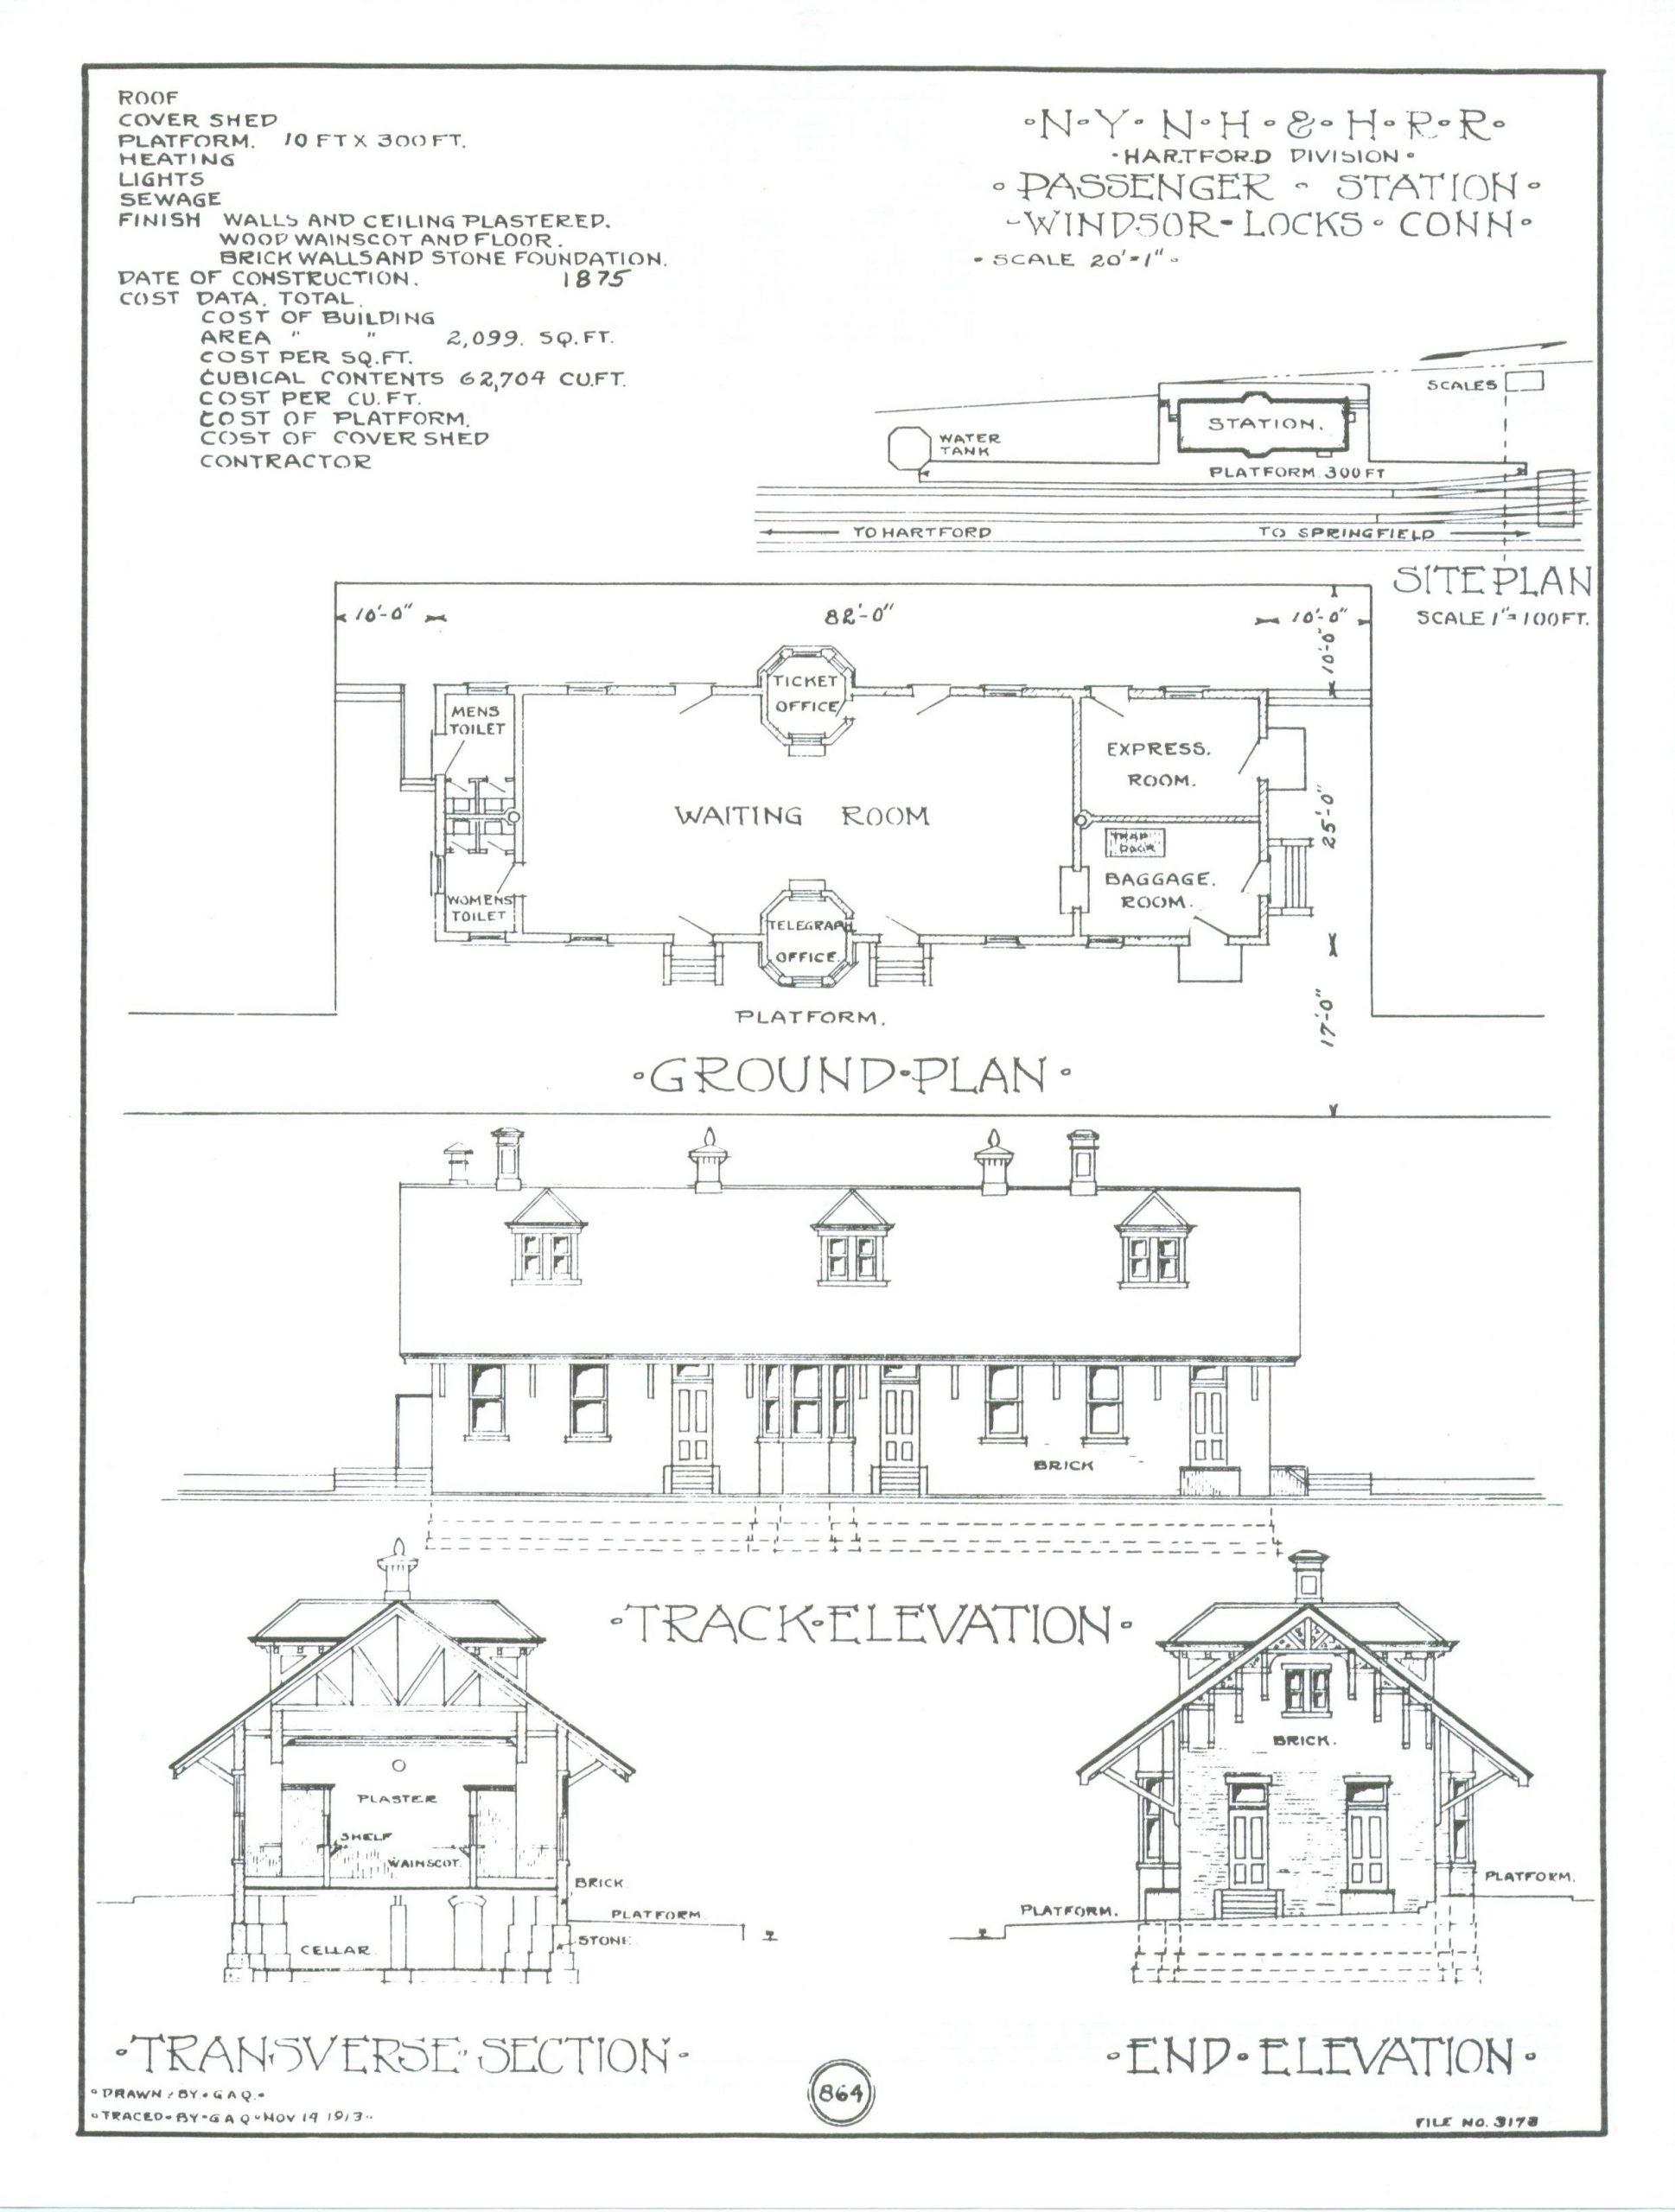 Blueprint Scale Drawing Worksheet | Printable Worksheets And